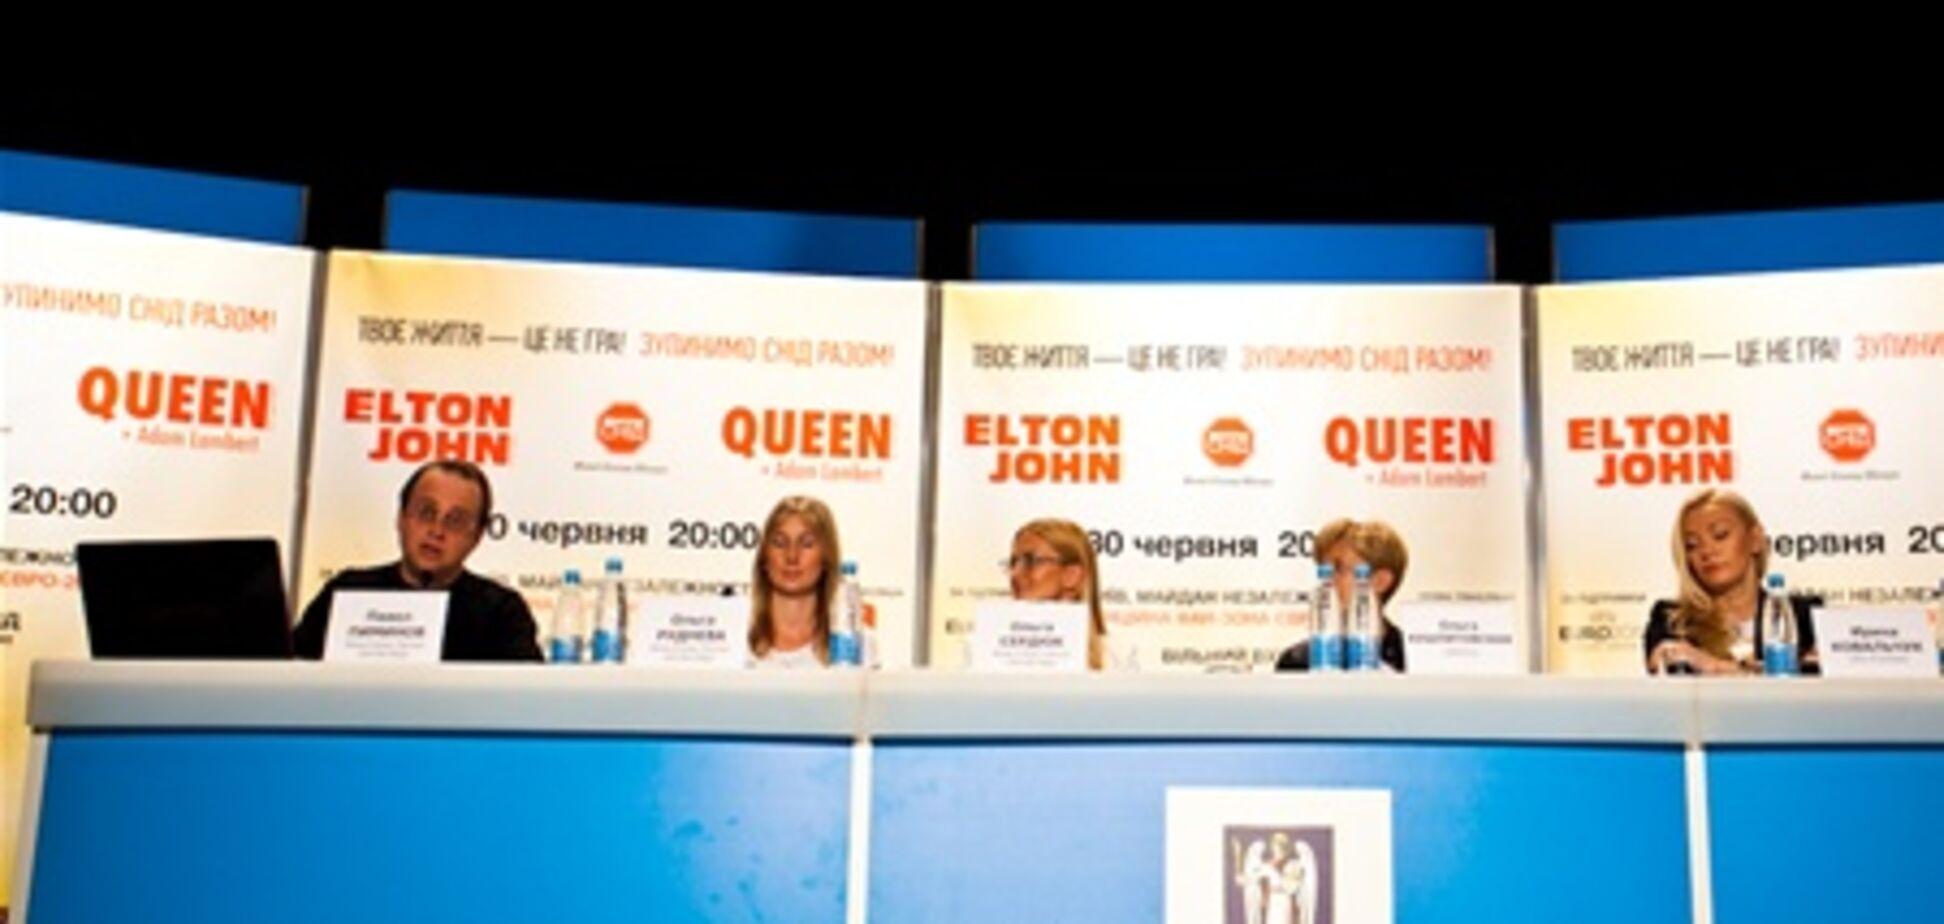 Елтон Джон і Queen у Києві грошей не отримають